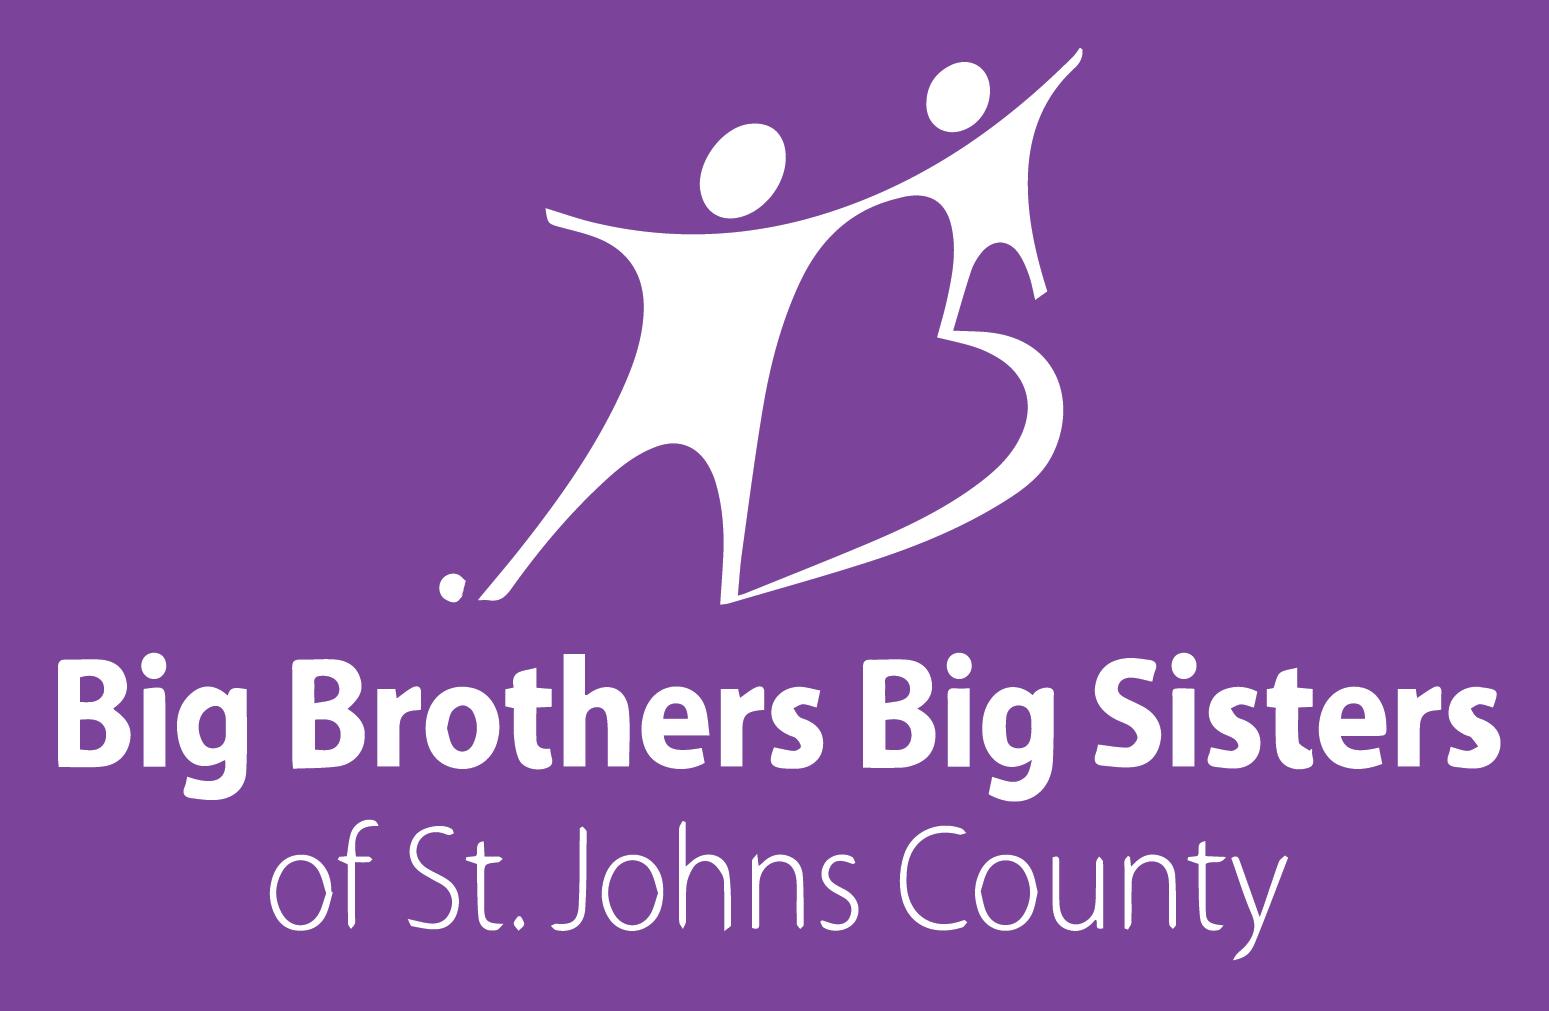 bbbs-logo-white-with-purple